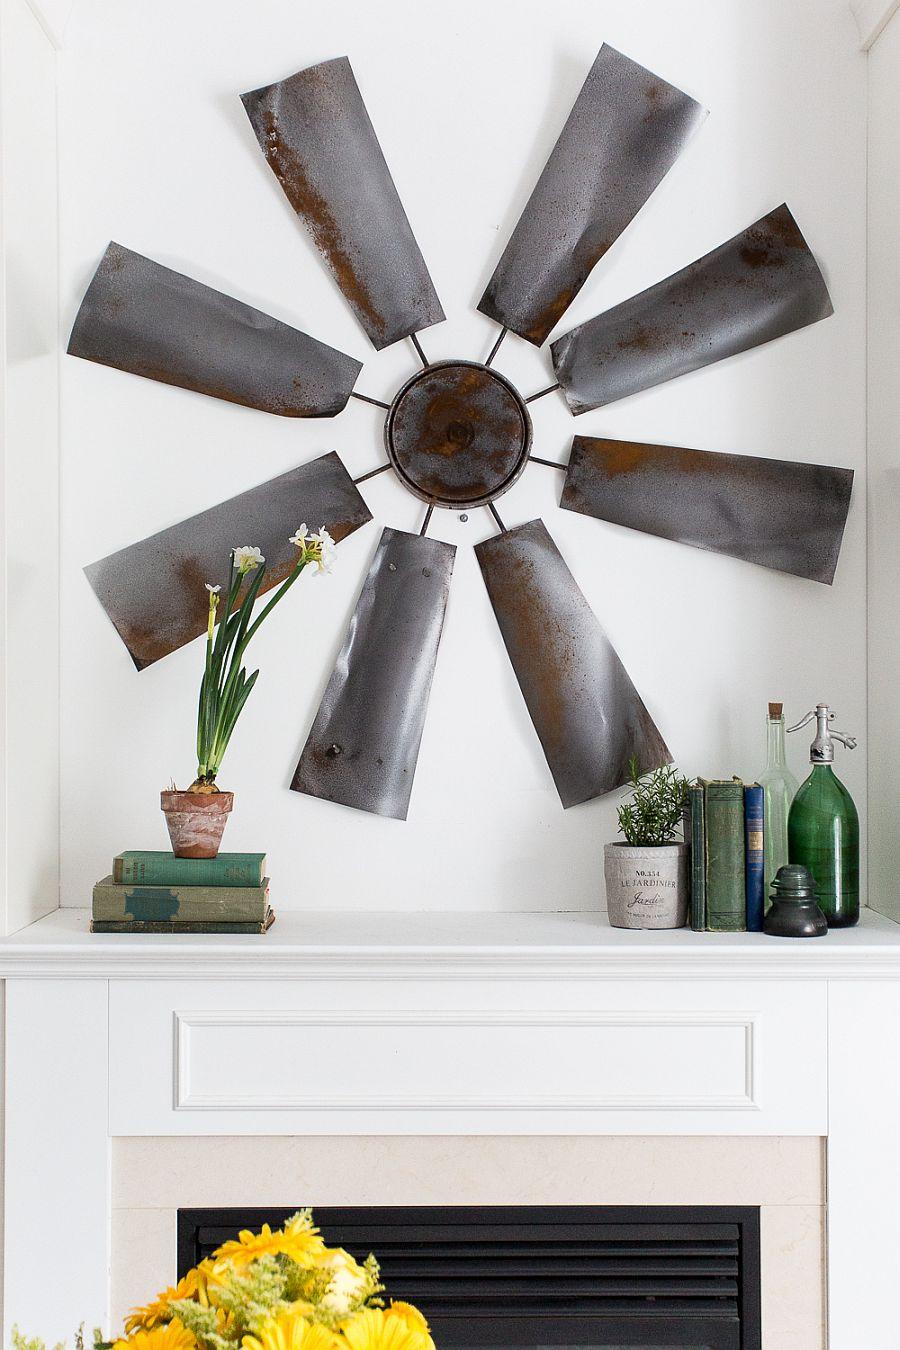 Striking and unique DIY windmill decor idea for the farmhouse entry